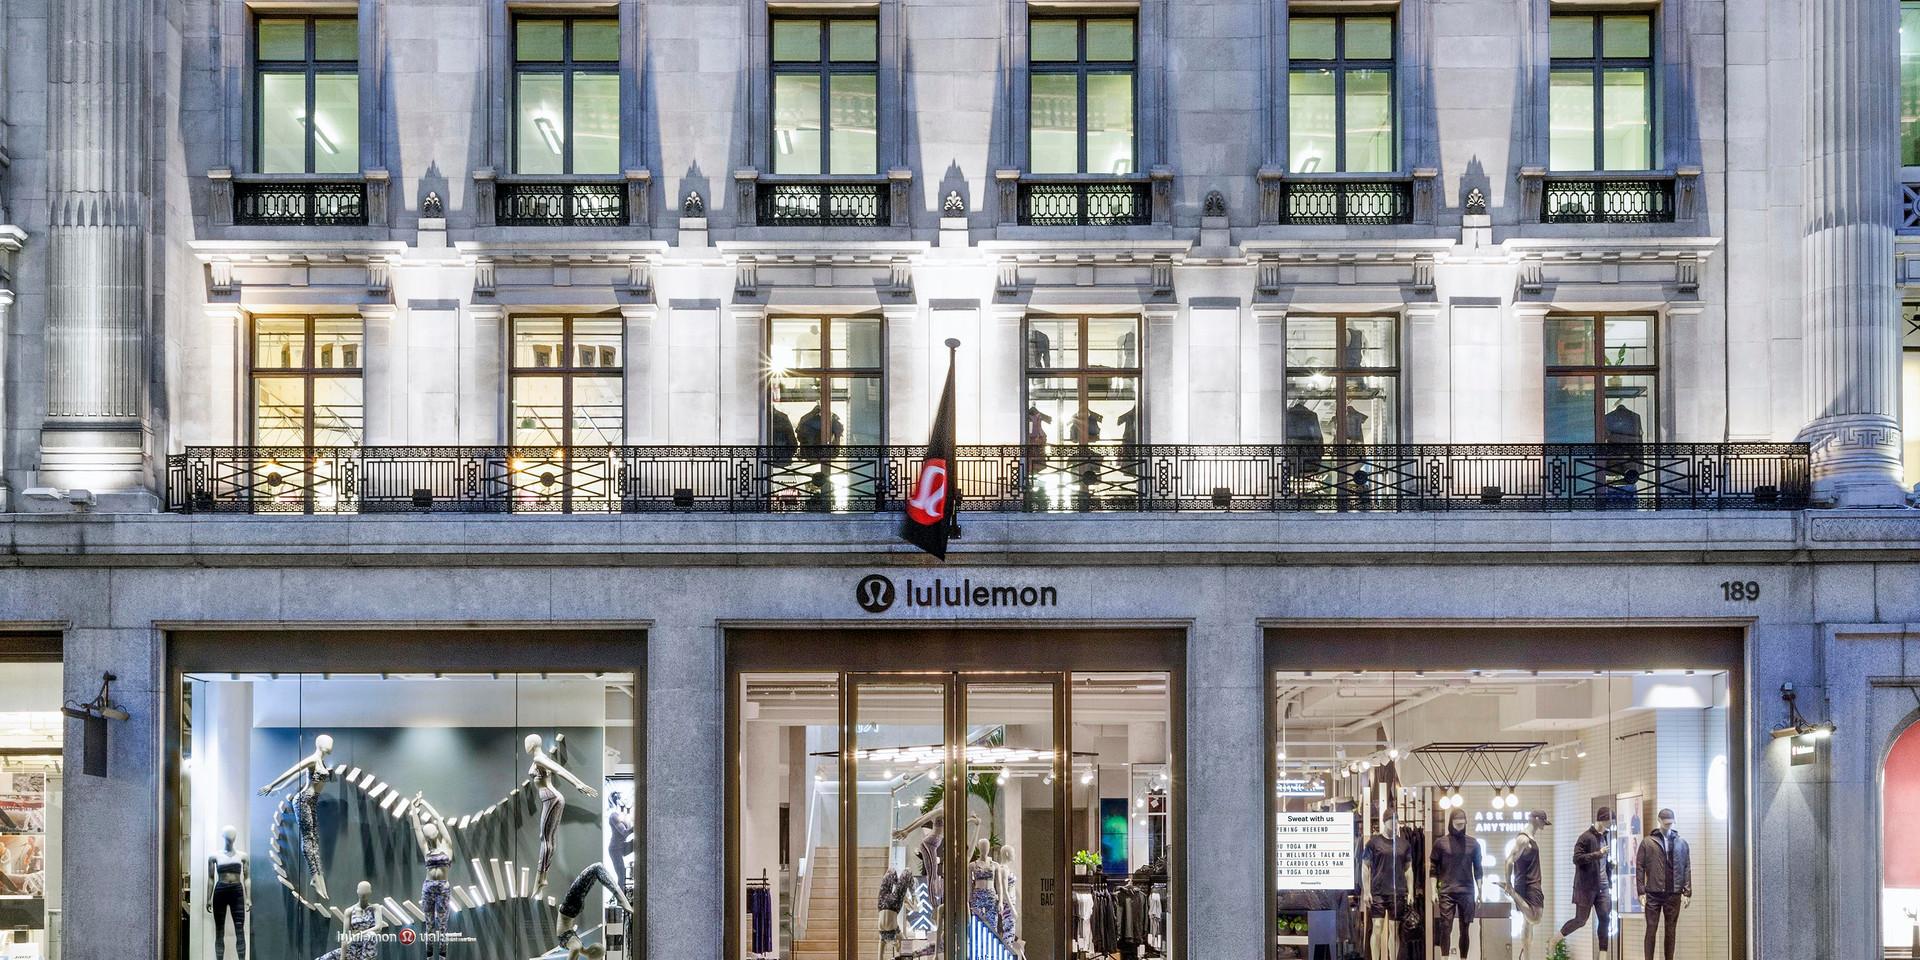 lululemon Regent St store frontage 2.jpg